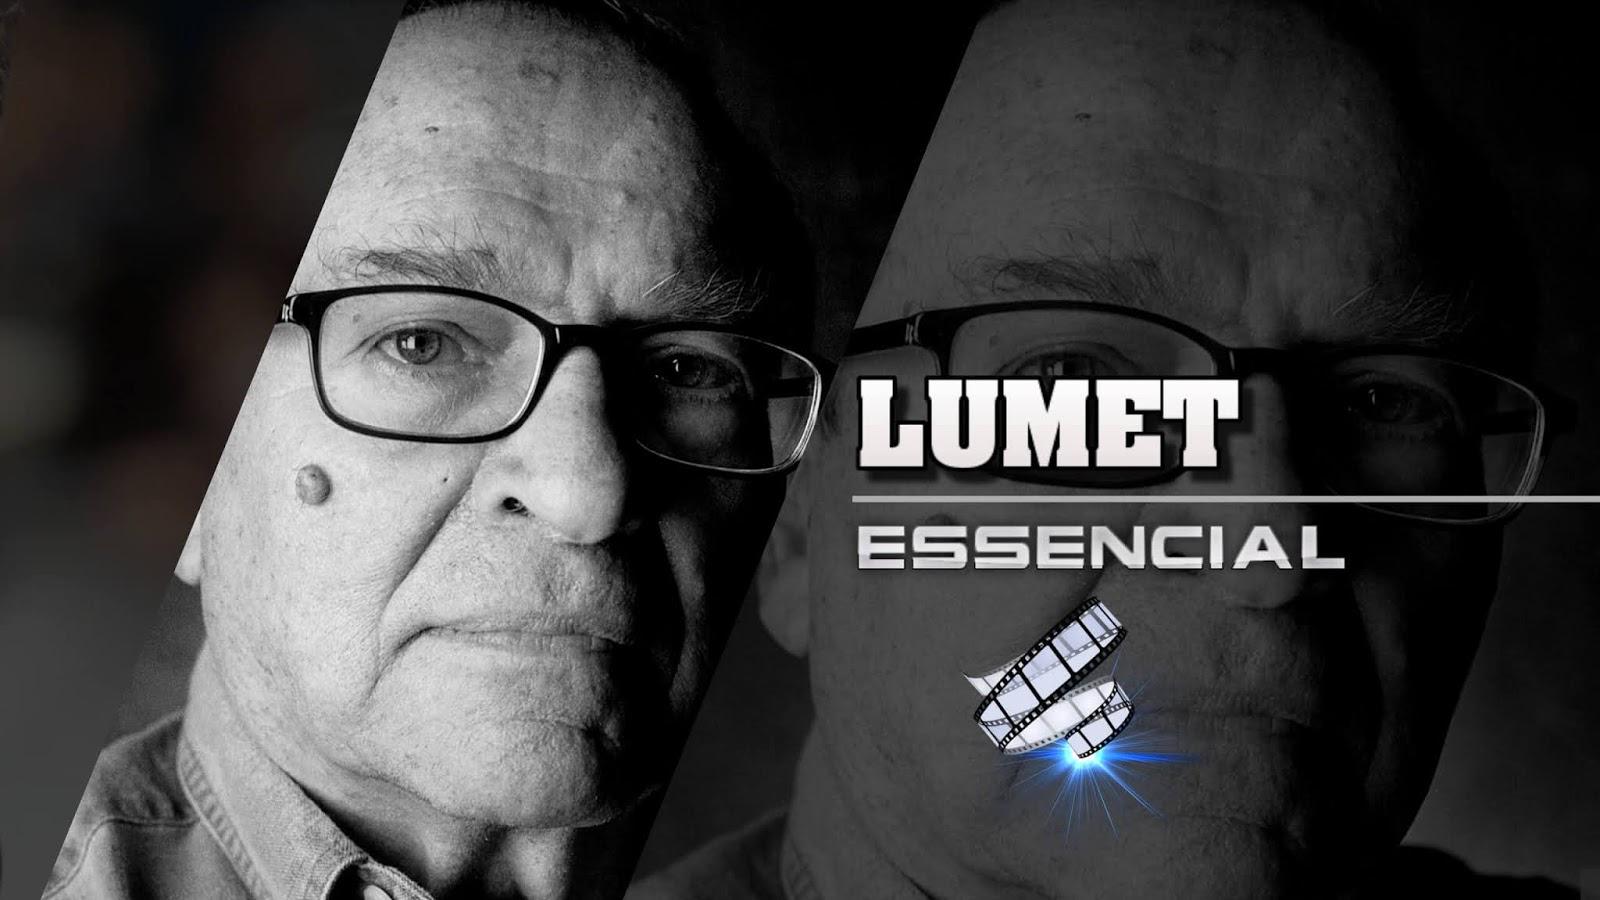 sidney-lumet-10-filmes-essenciais